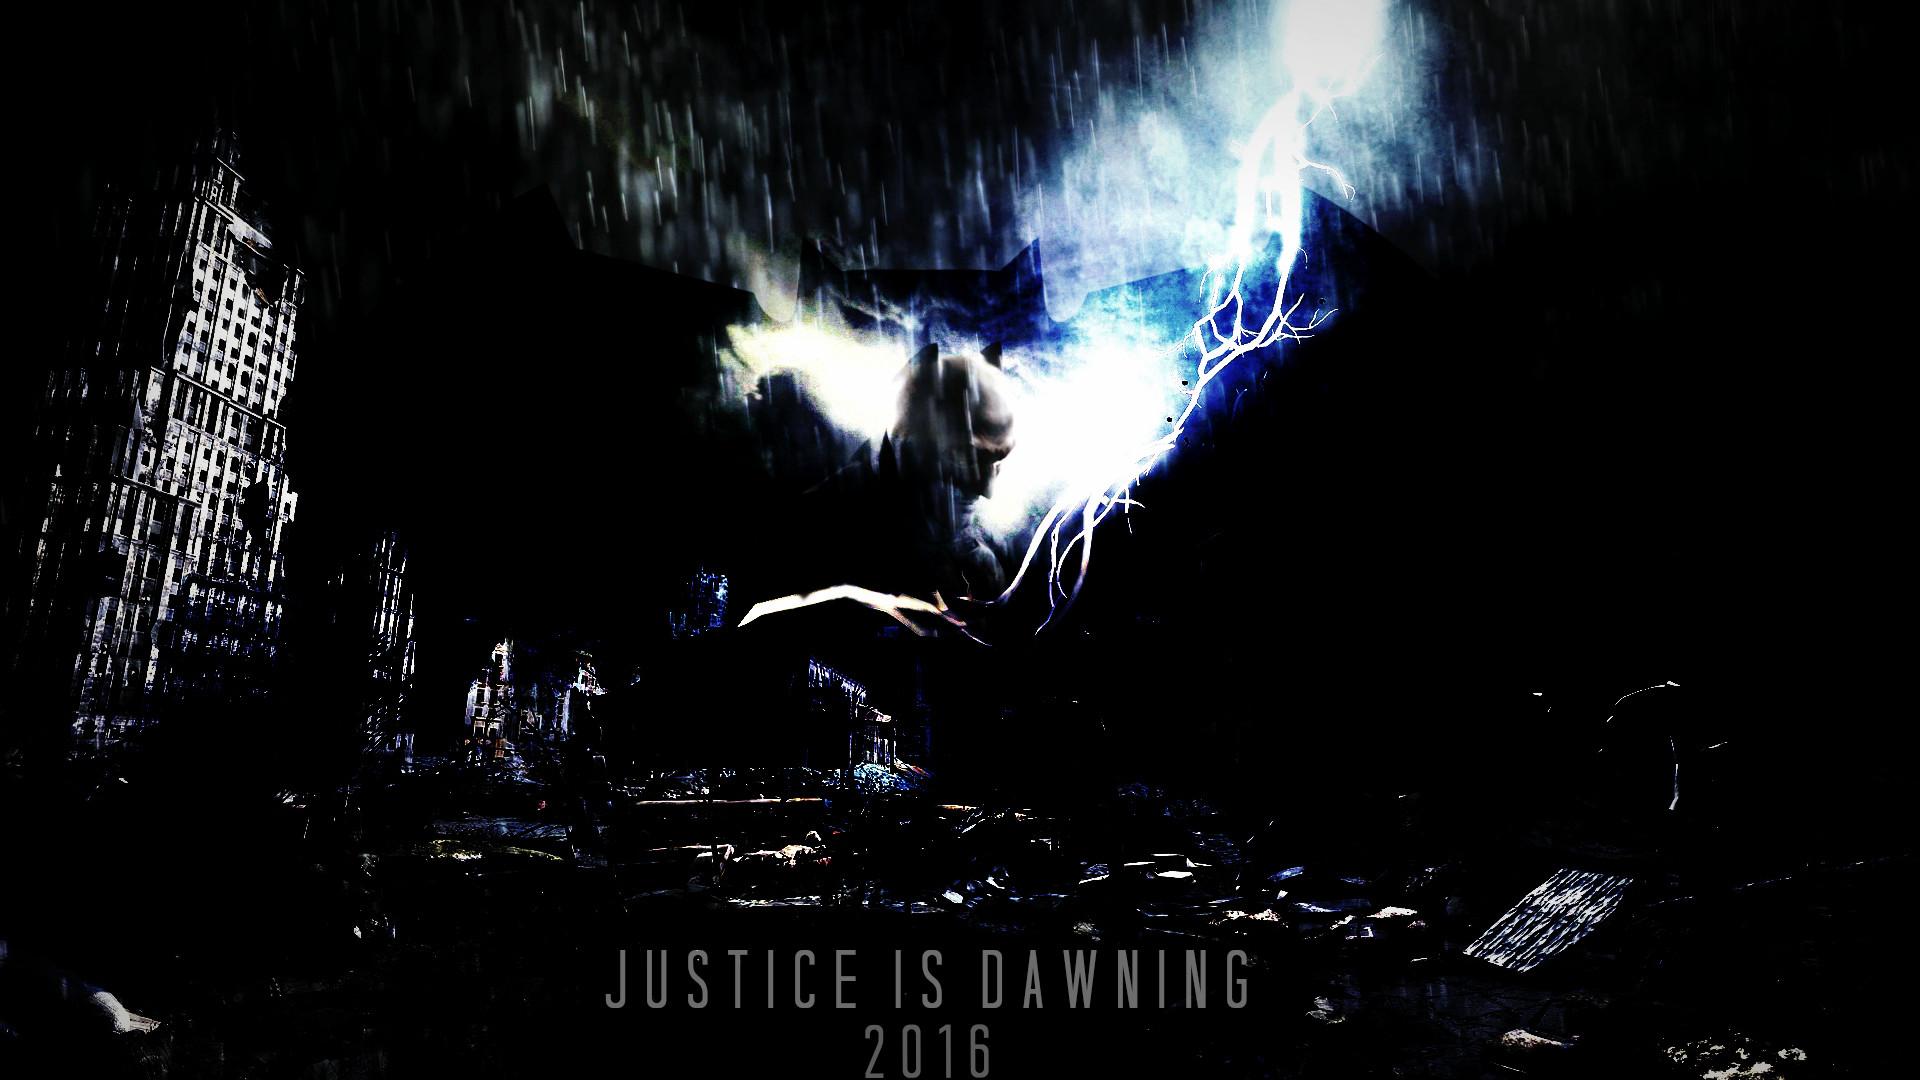 Batman Vs Superman Dawn Of Justice Wallpaper Phone #jb1 • Movie at .